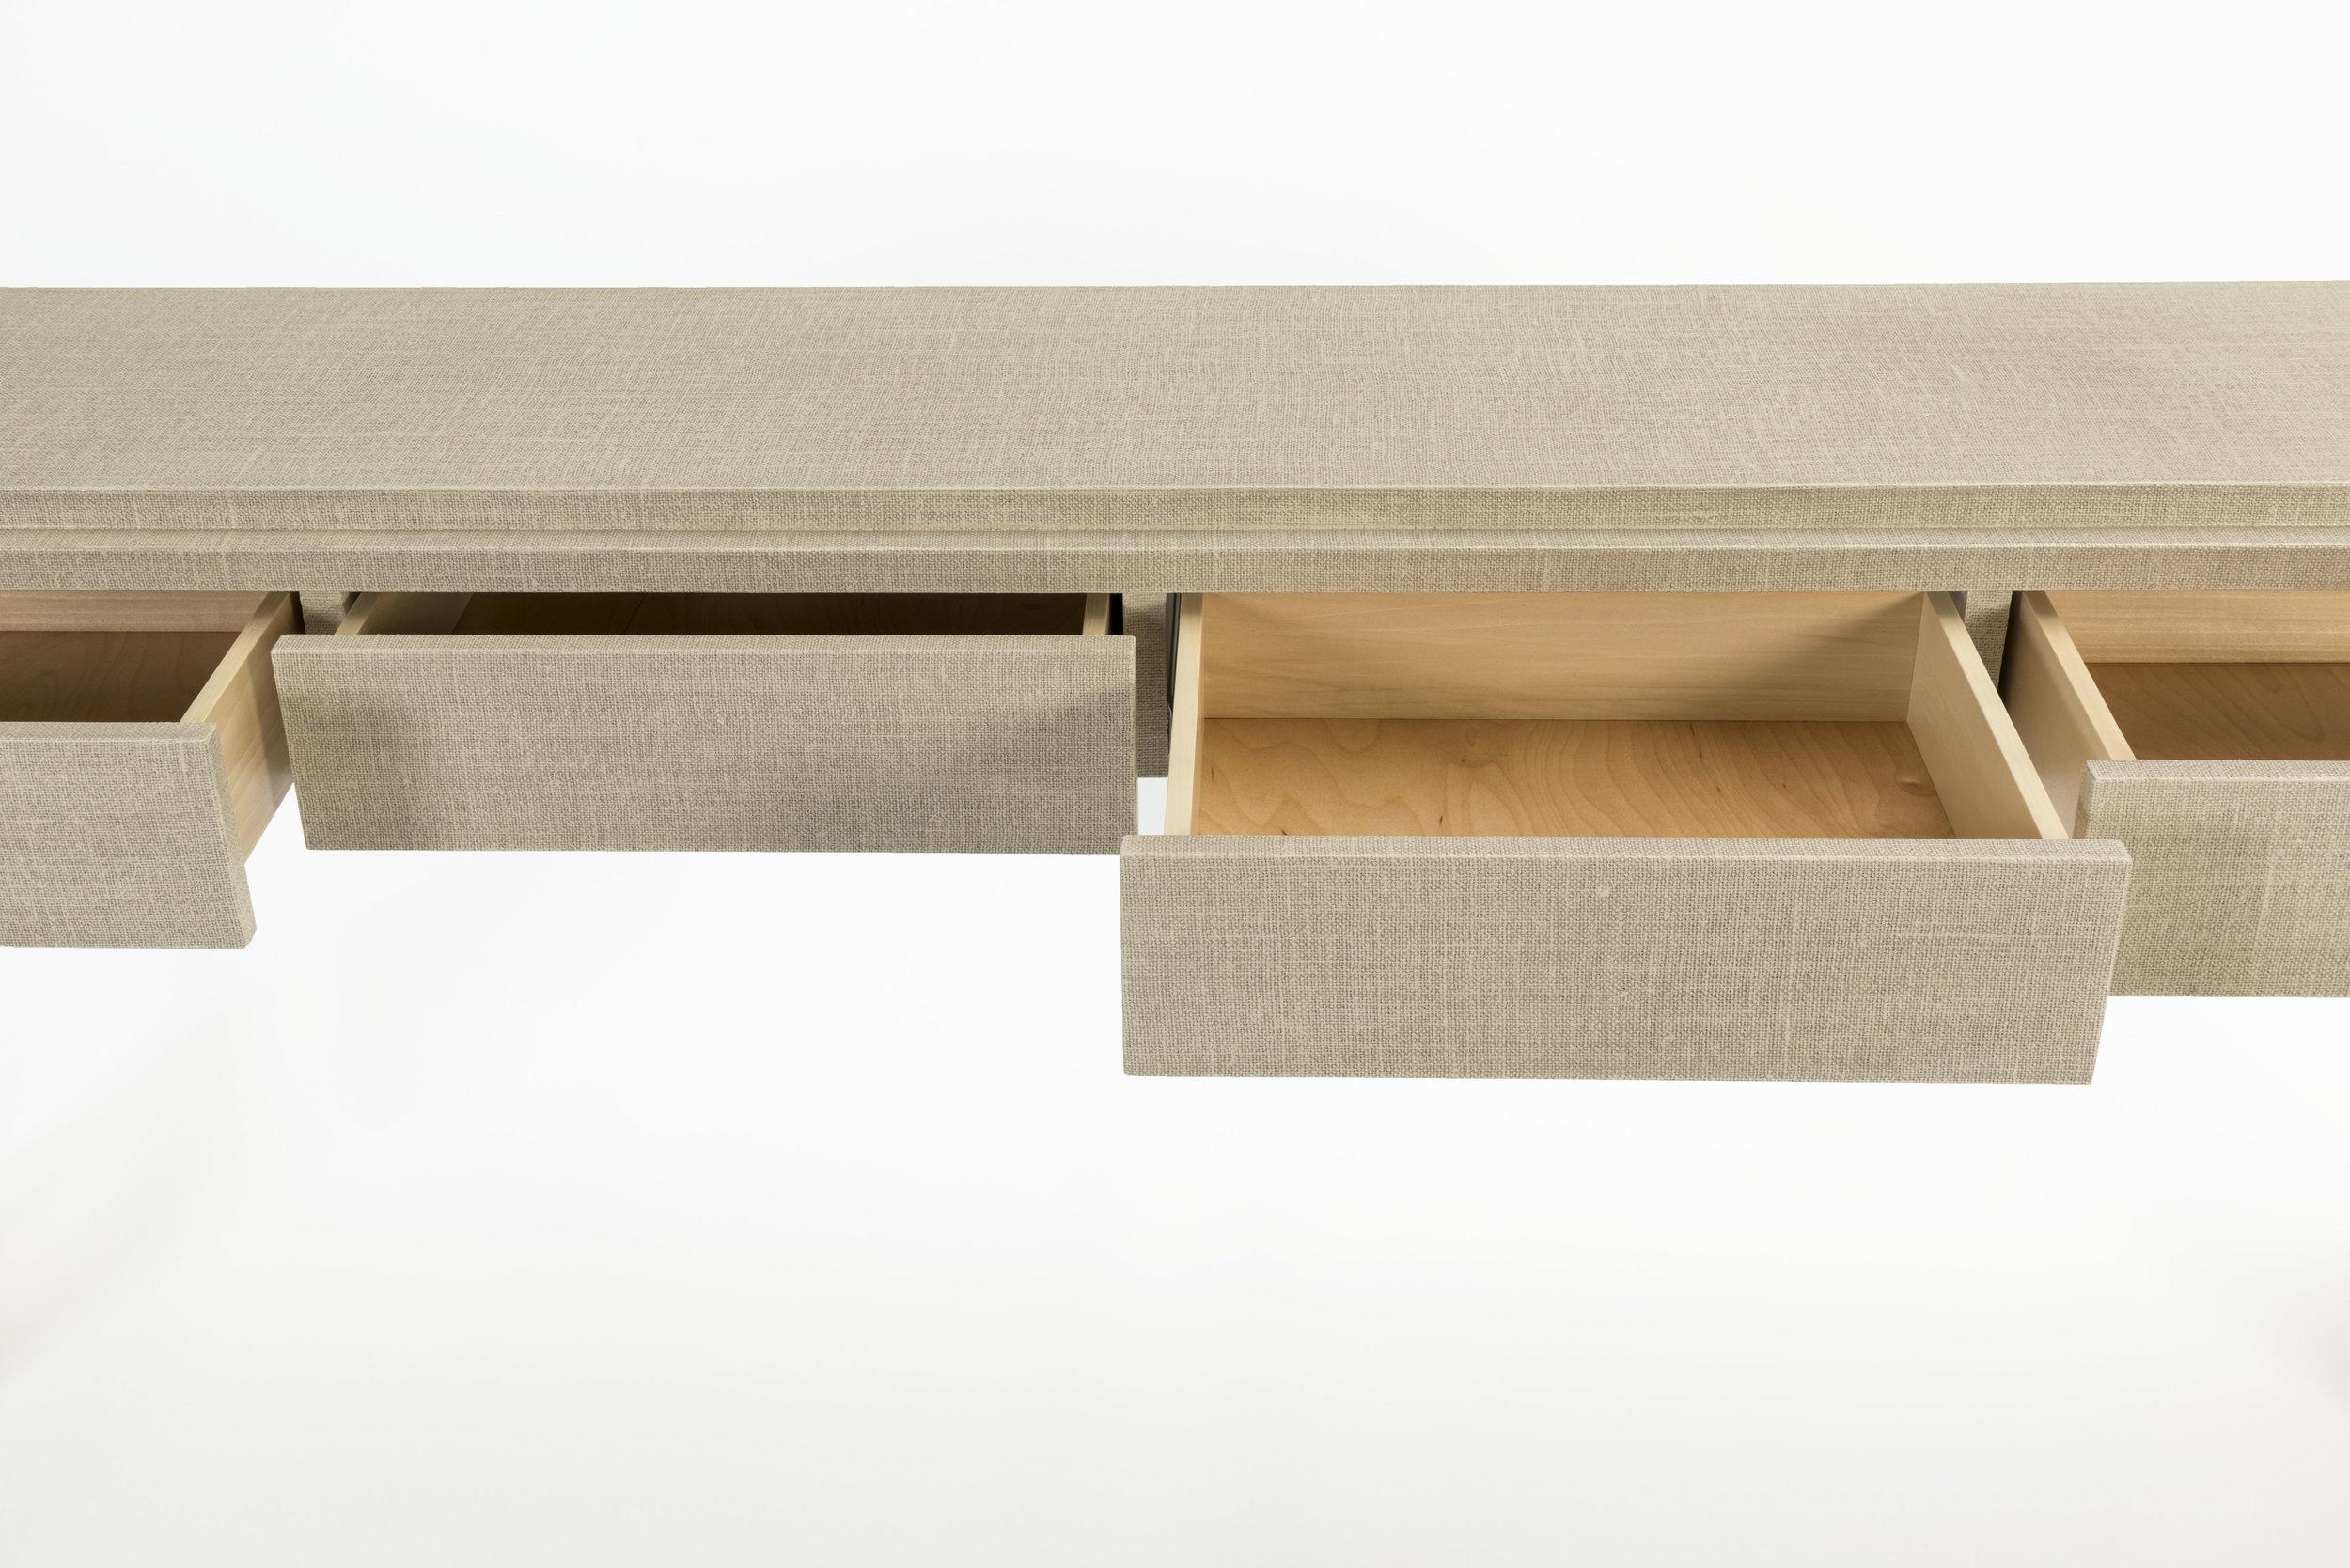 drawers-open.jpg